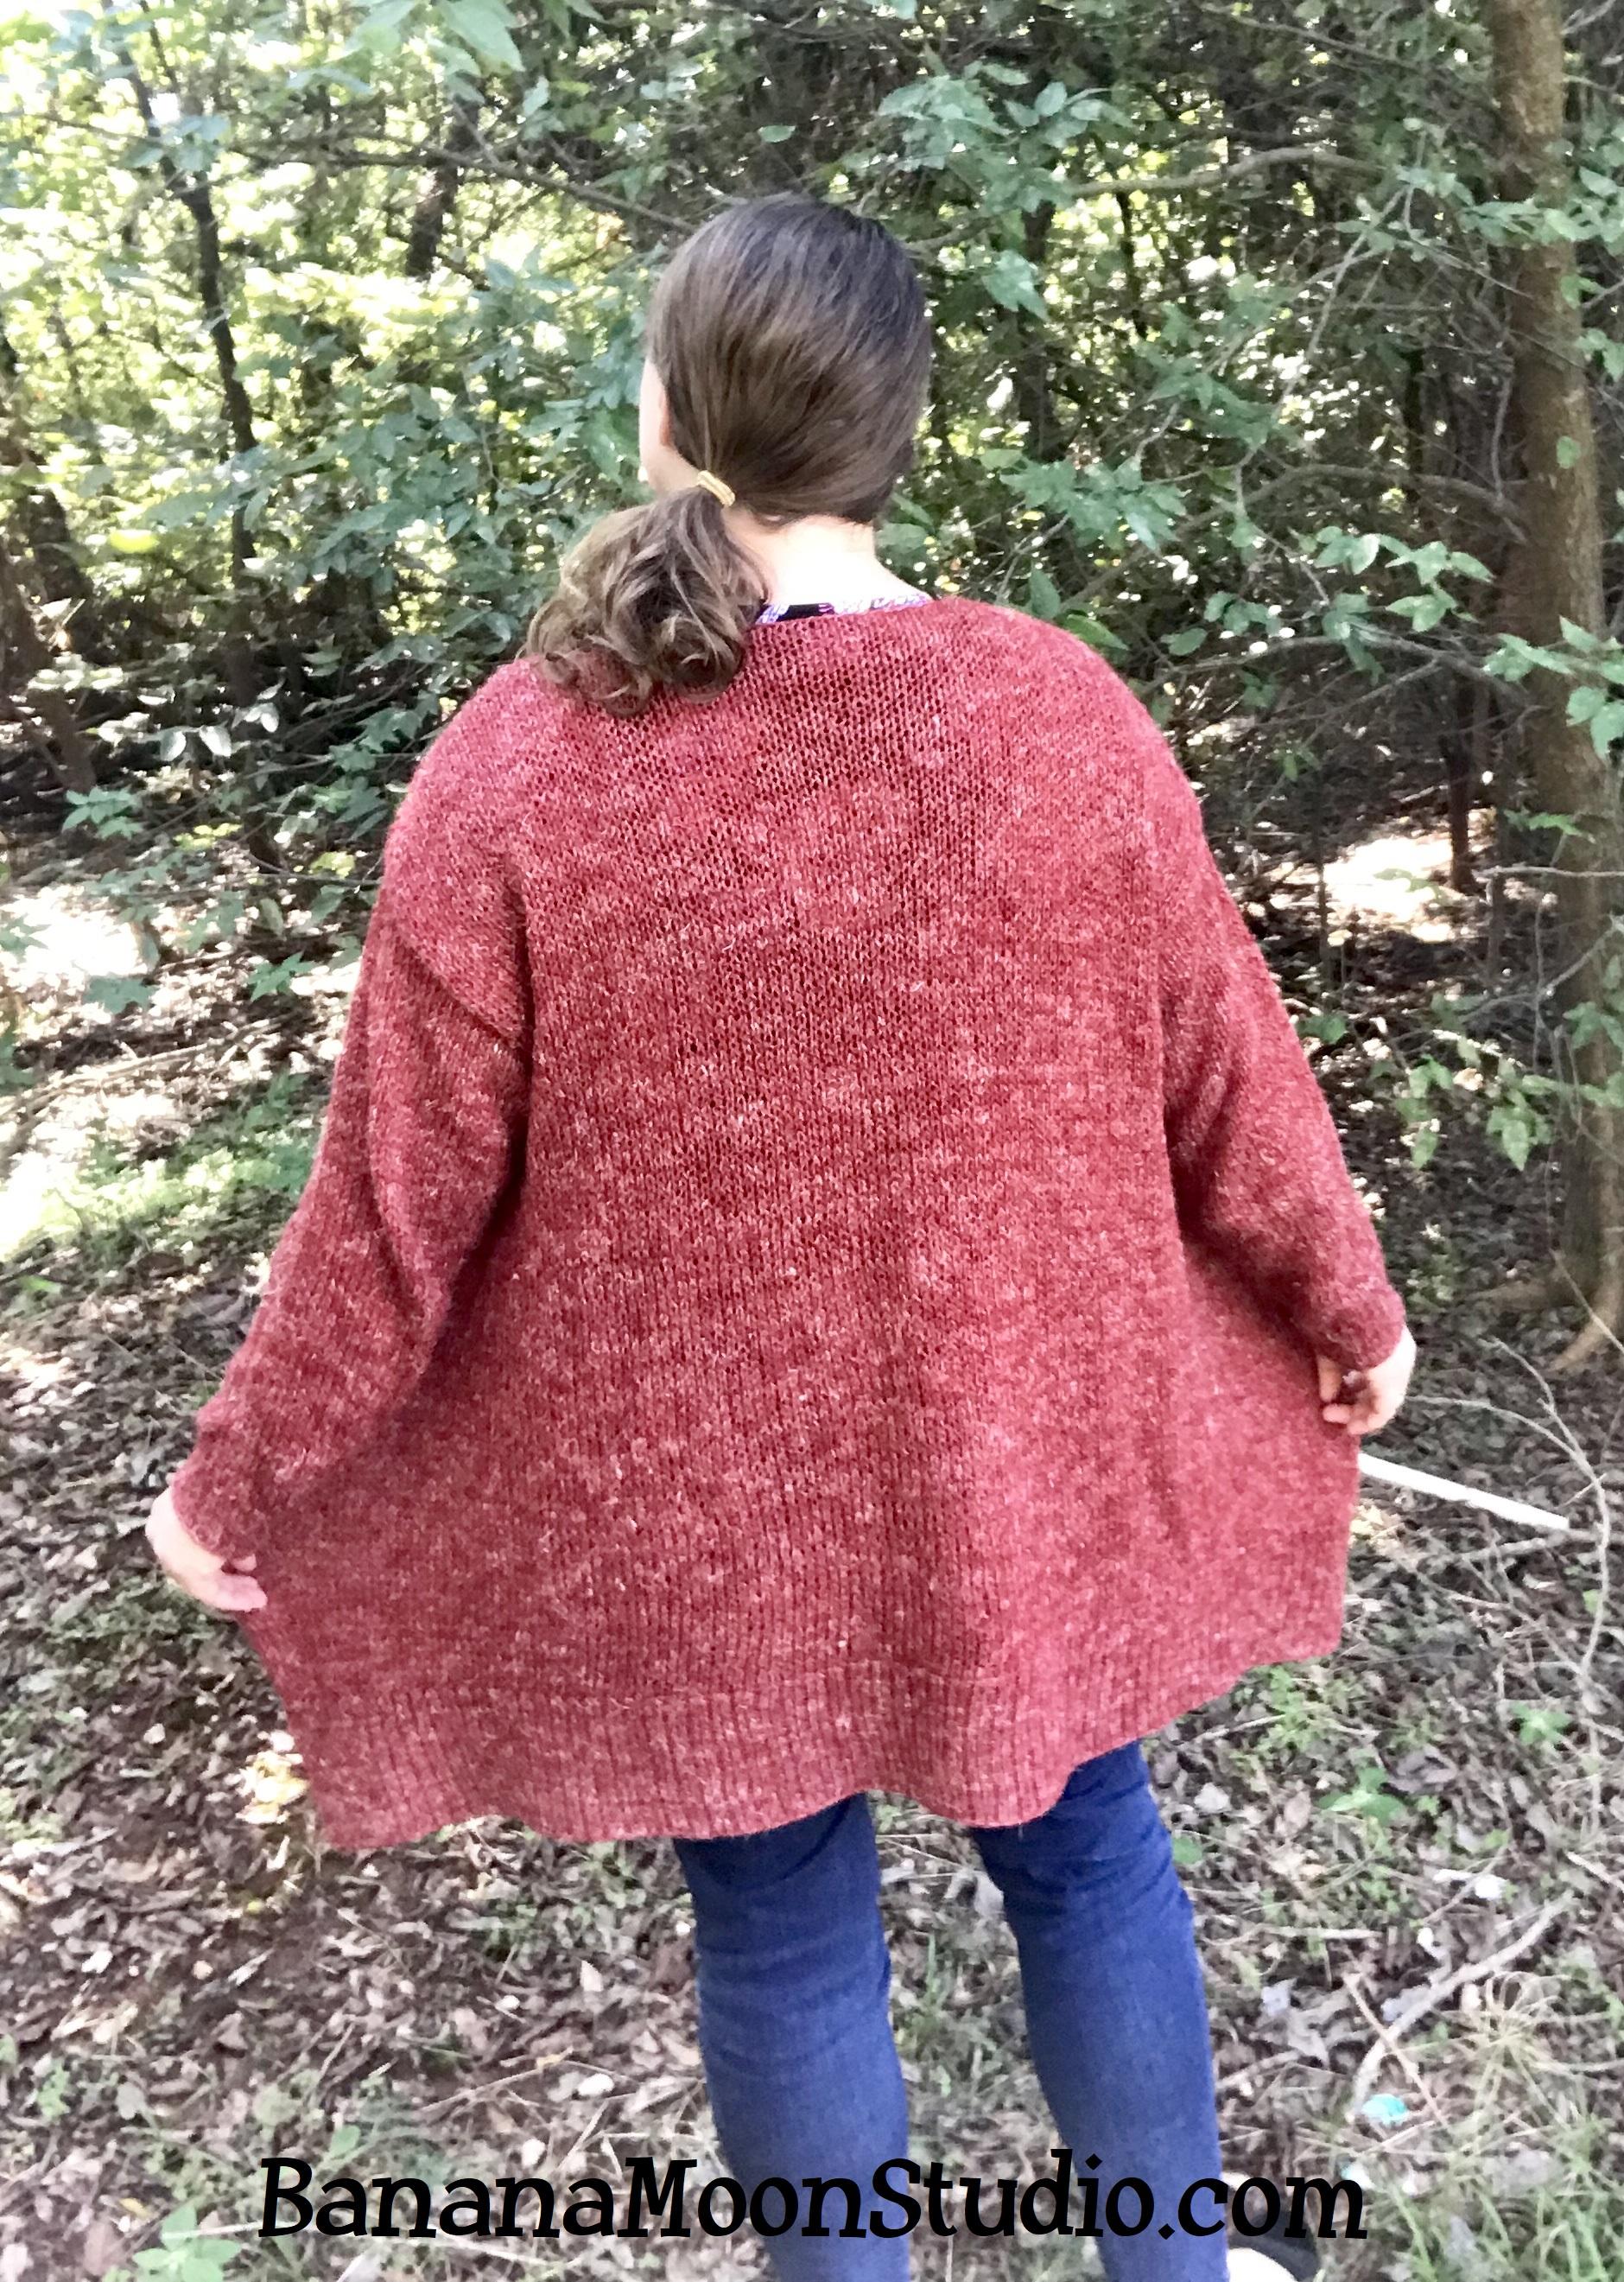 Eufaula Cardigan, a free knitting pattern for this casual women's cardigan from Banana Moon Studio